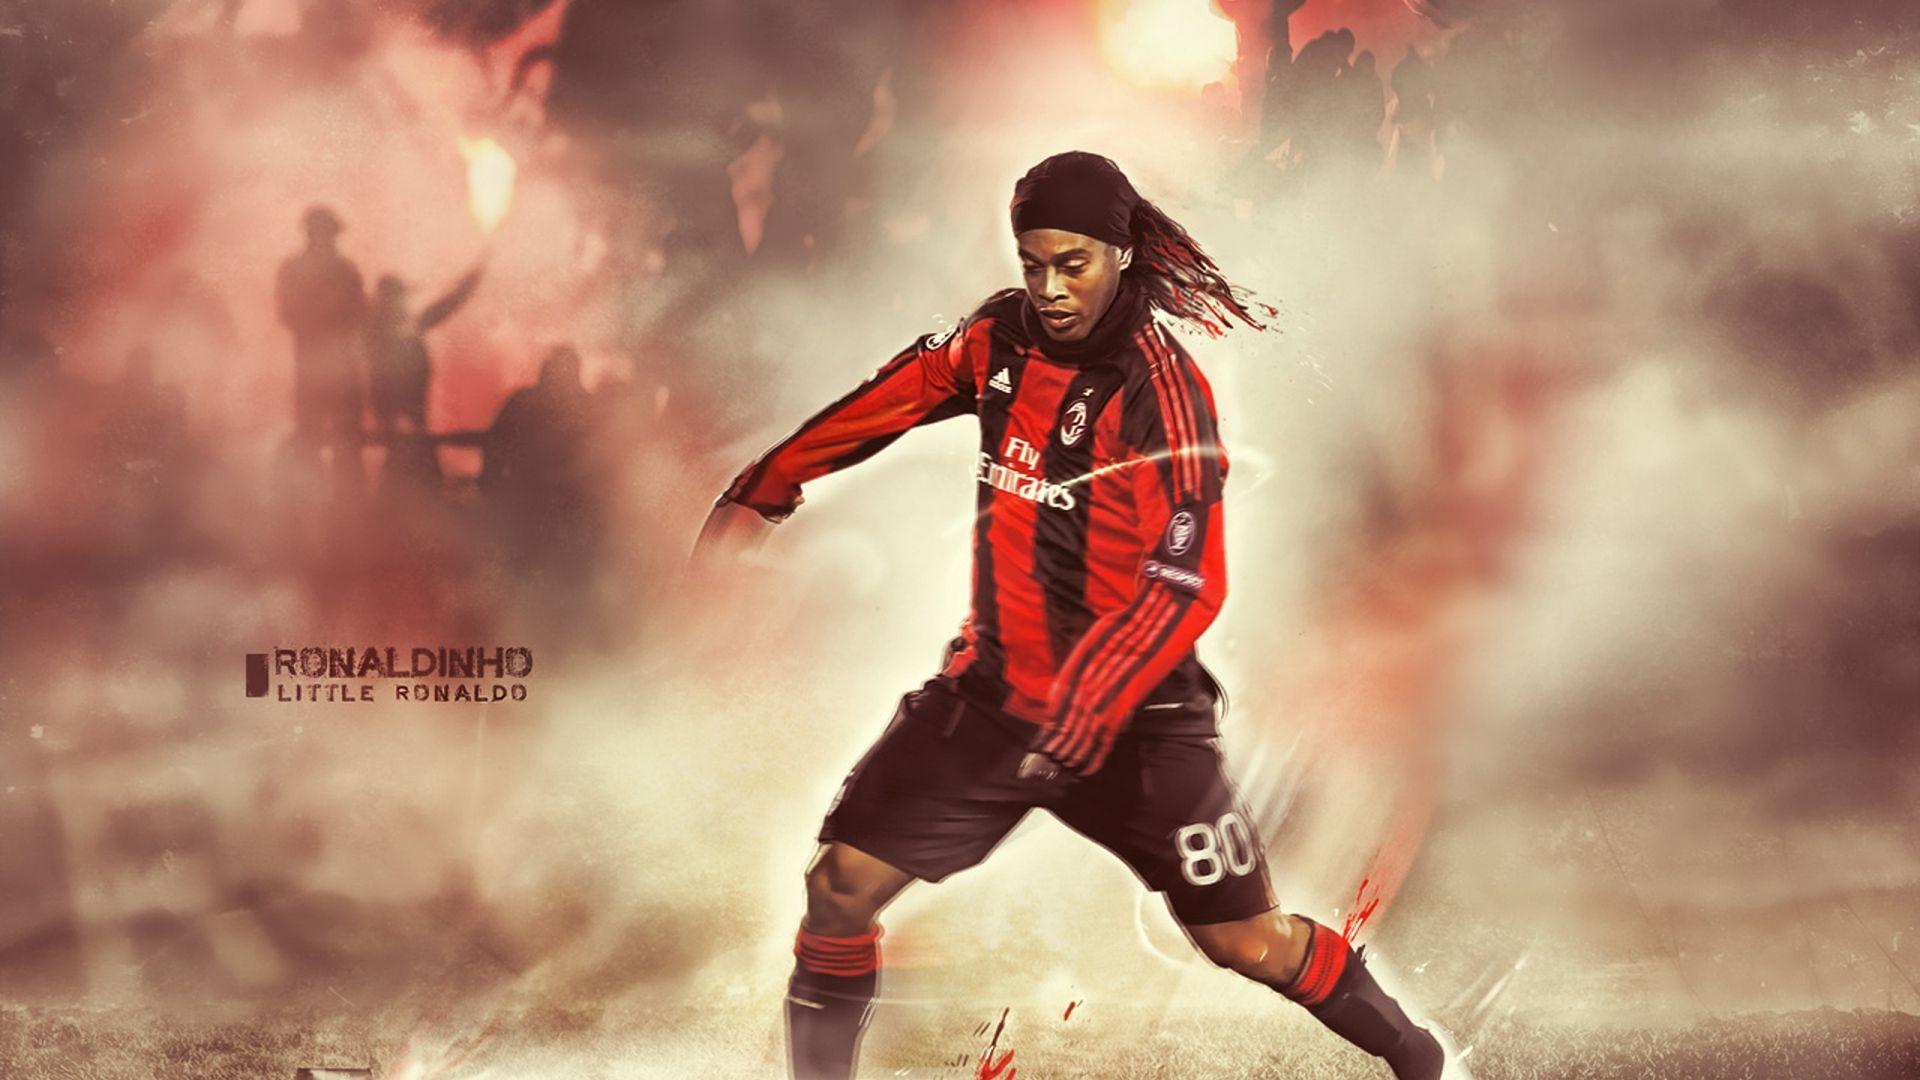 Football wallpaper x